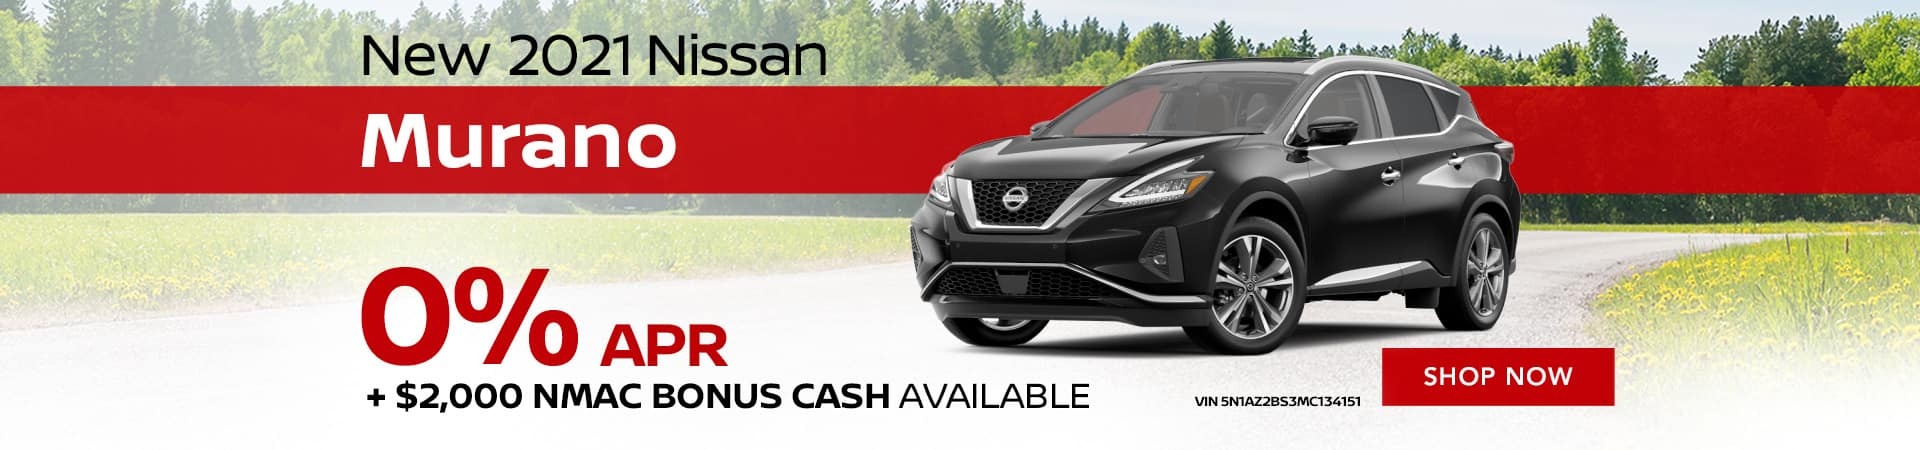 JRN_1920x450_New 2021 Nissan Murano __07'21